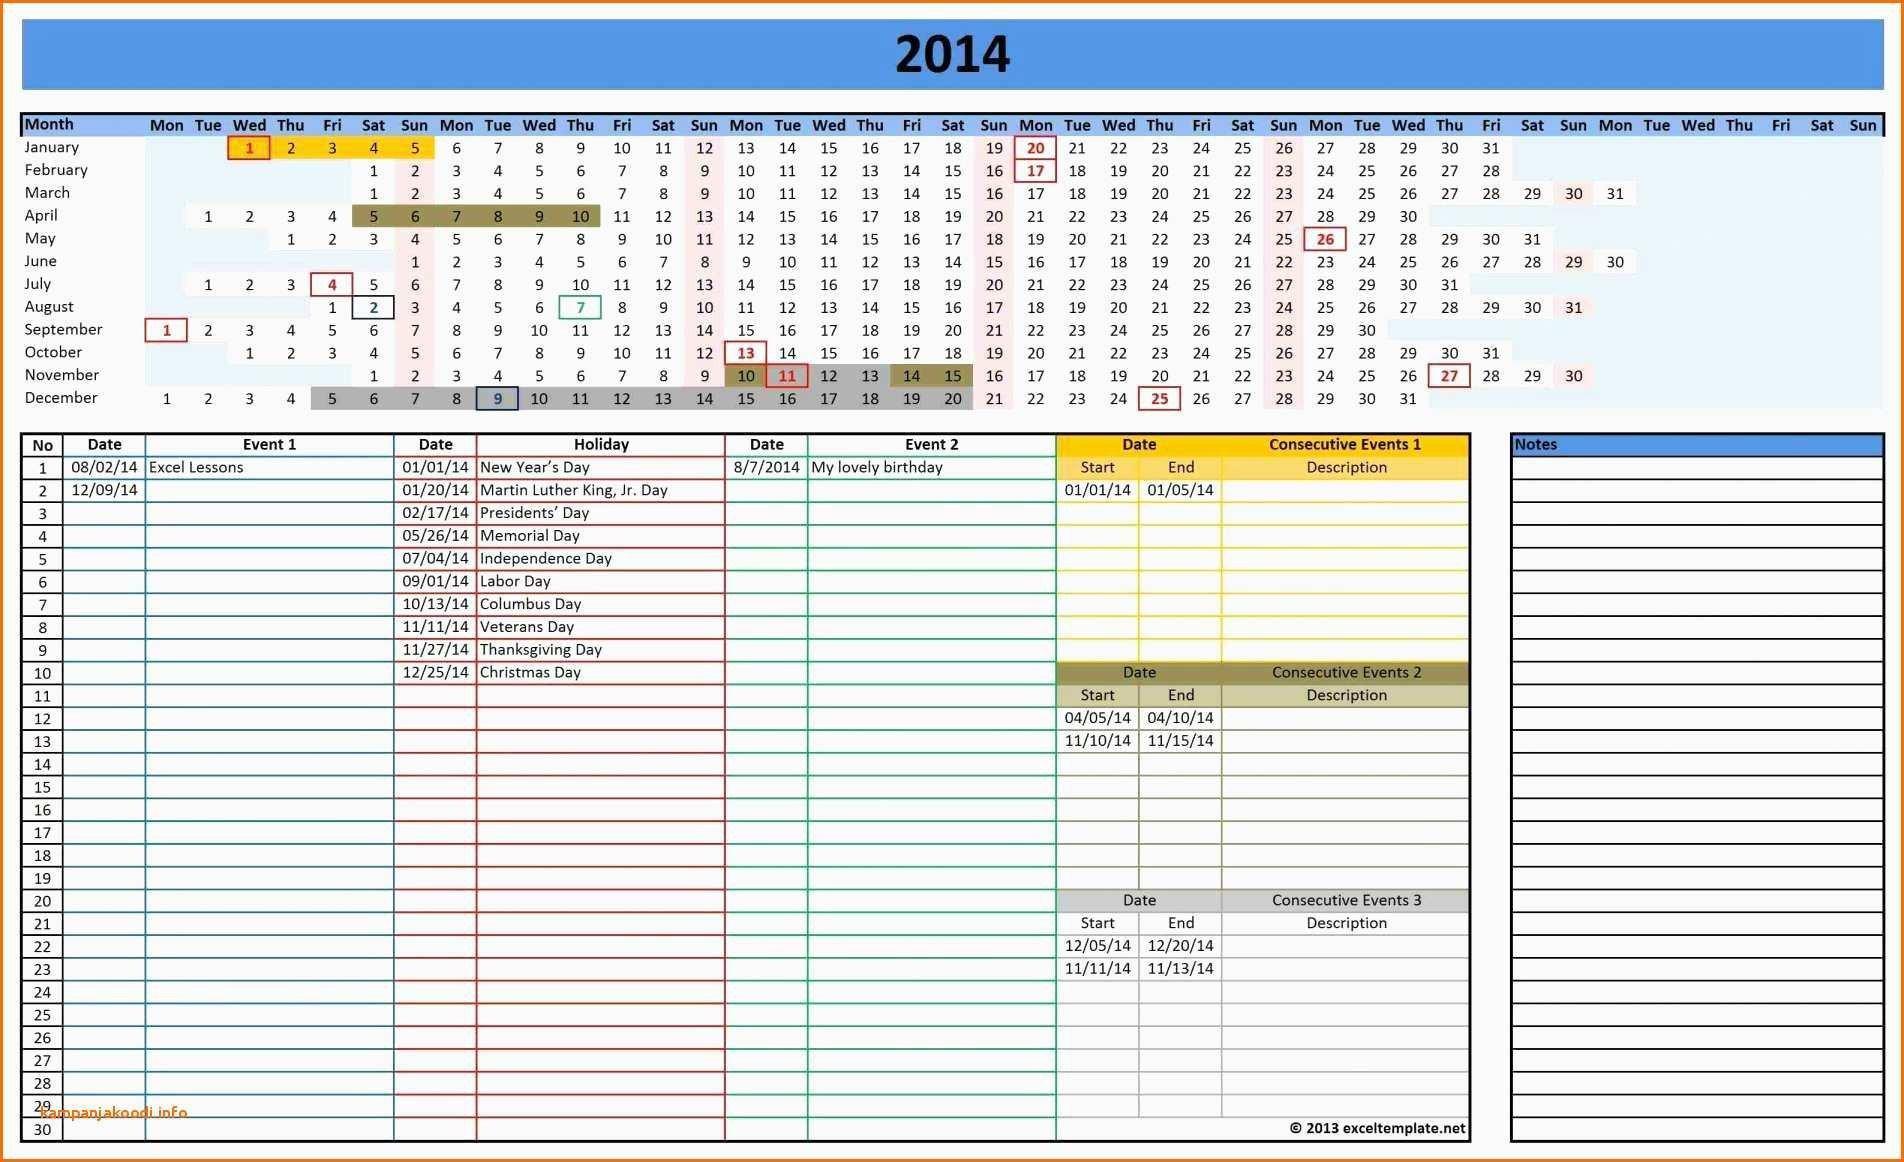 Landlord Accounting Spreadsheet | Islamopedia.se Or Landlord Bookkeeping Spreadsheet